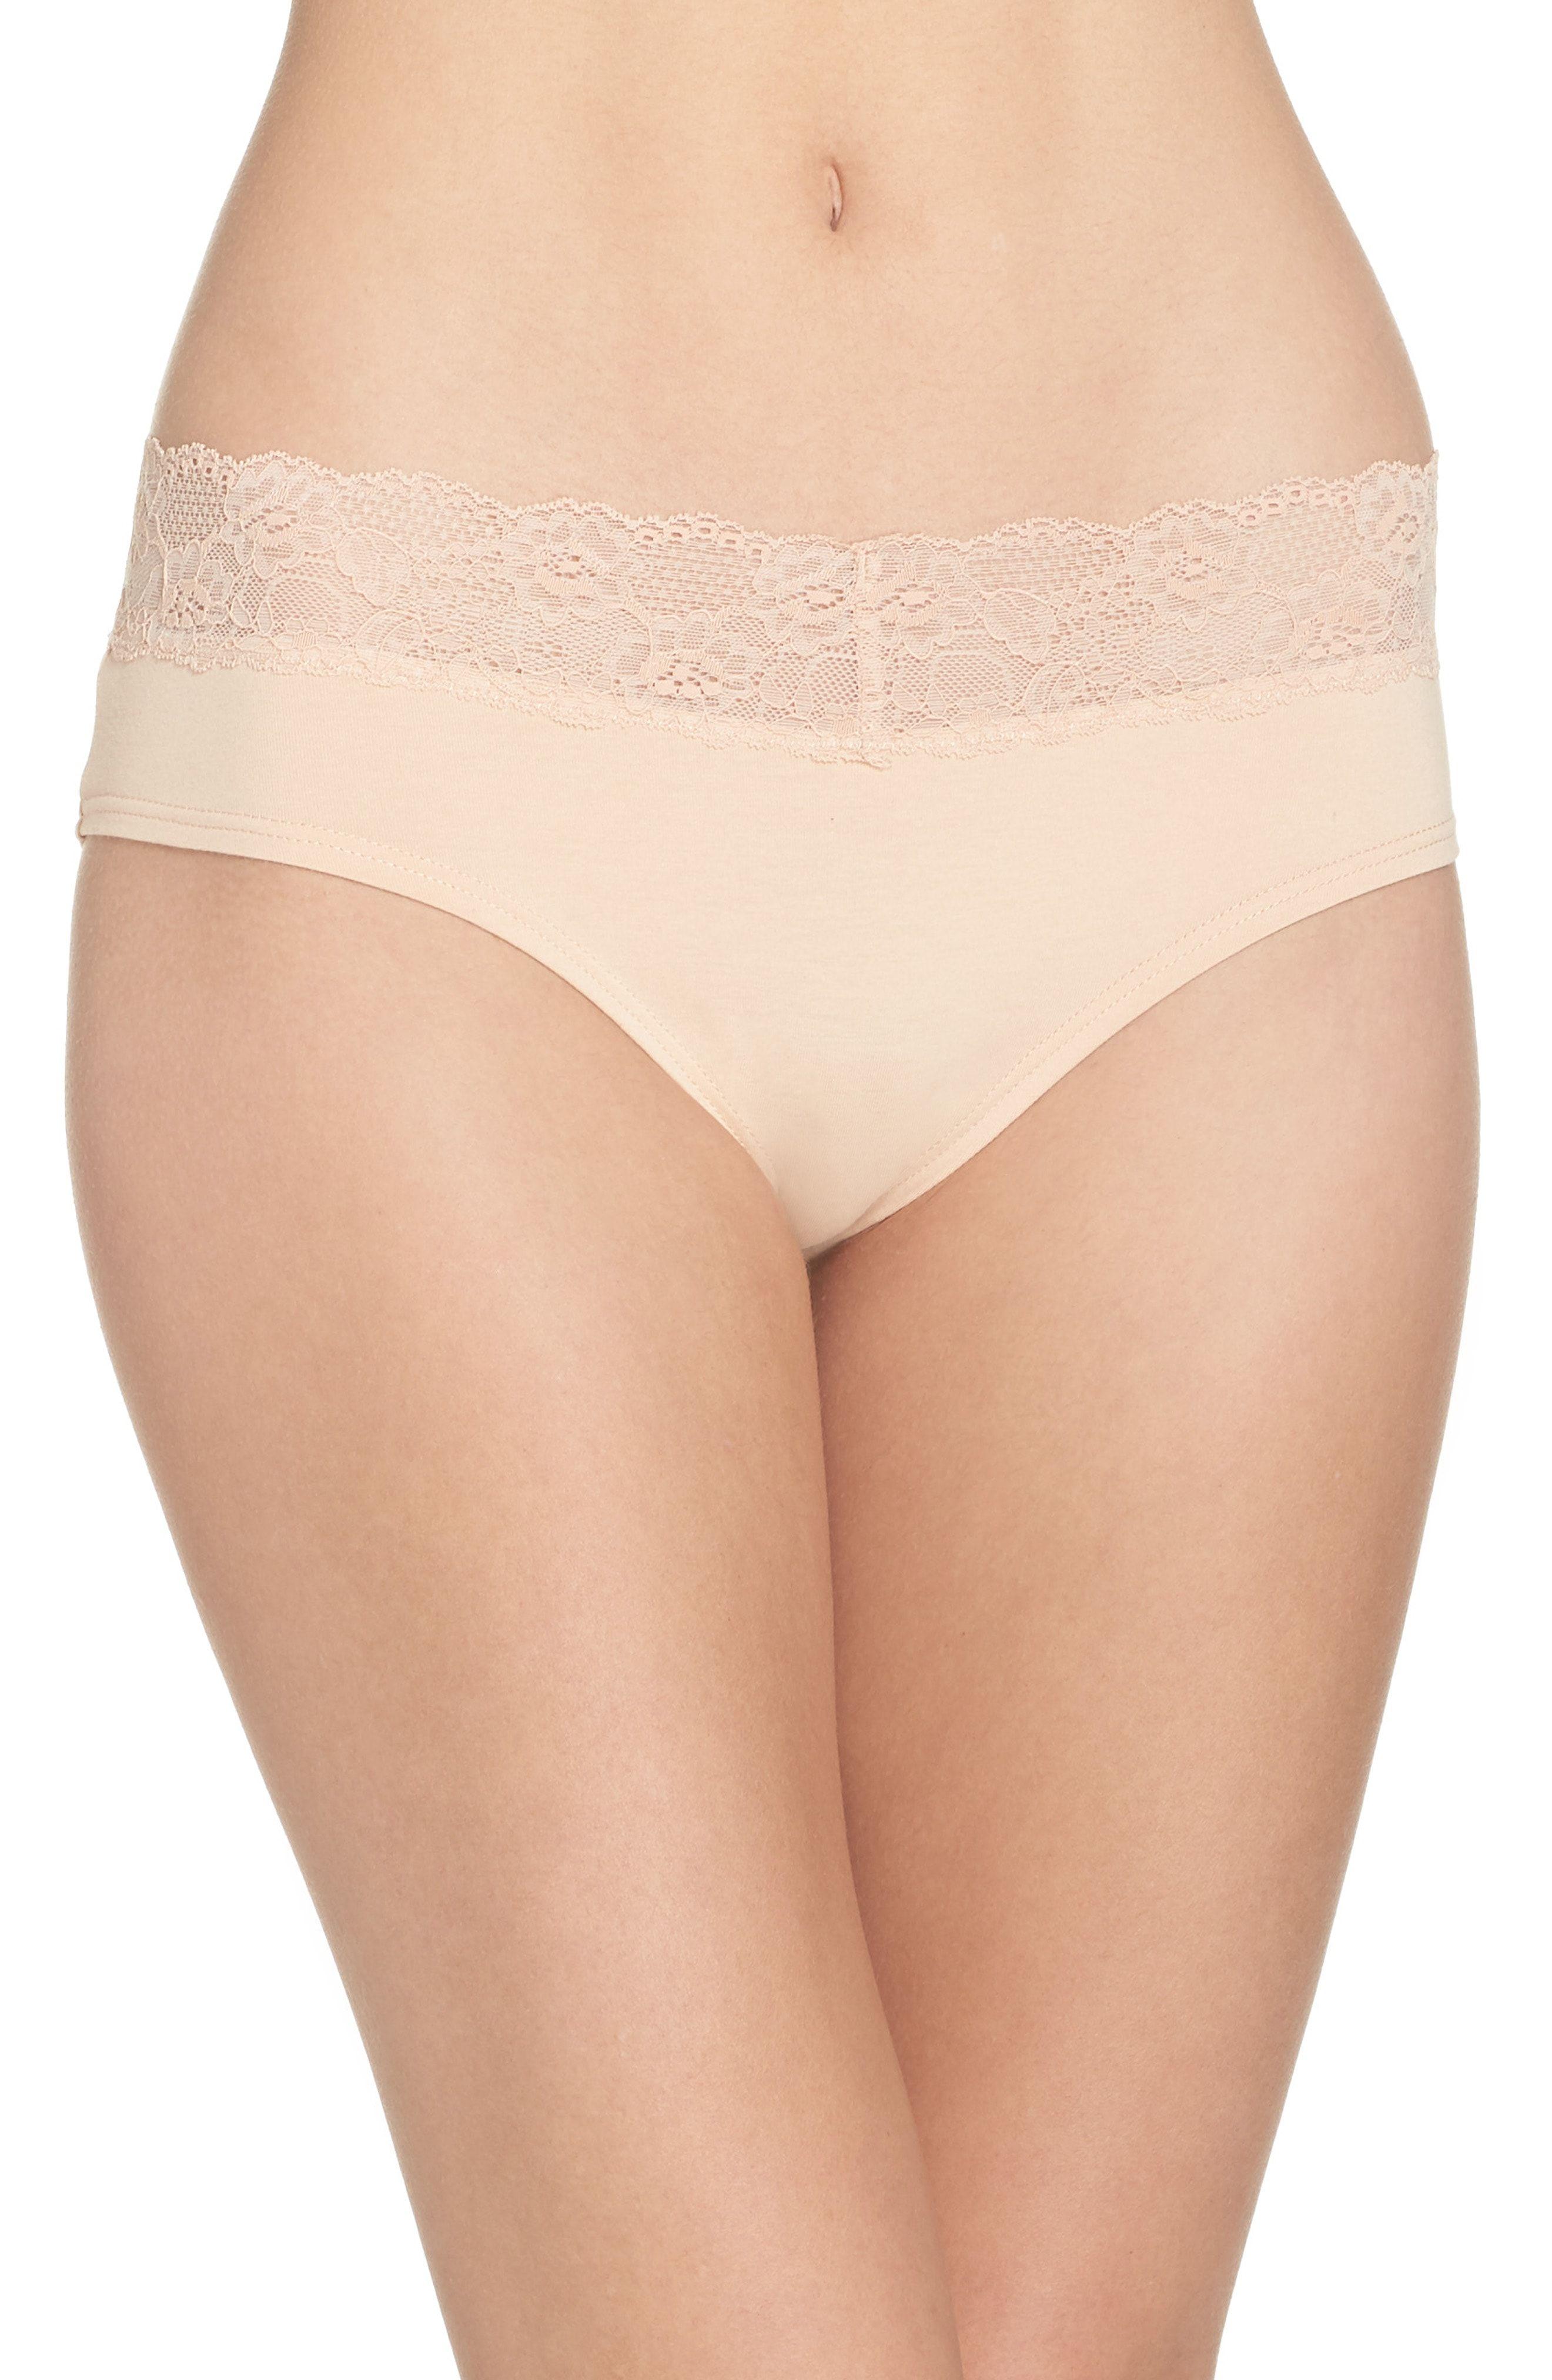 Moist Cotton Panties Scenes